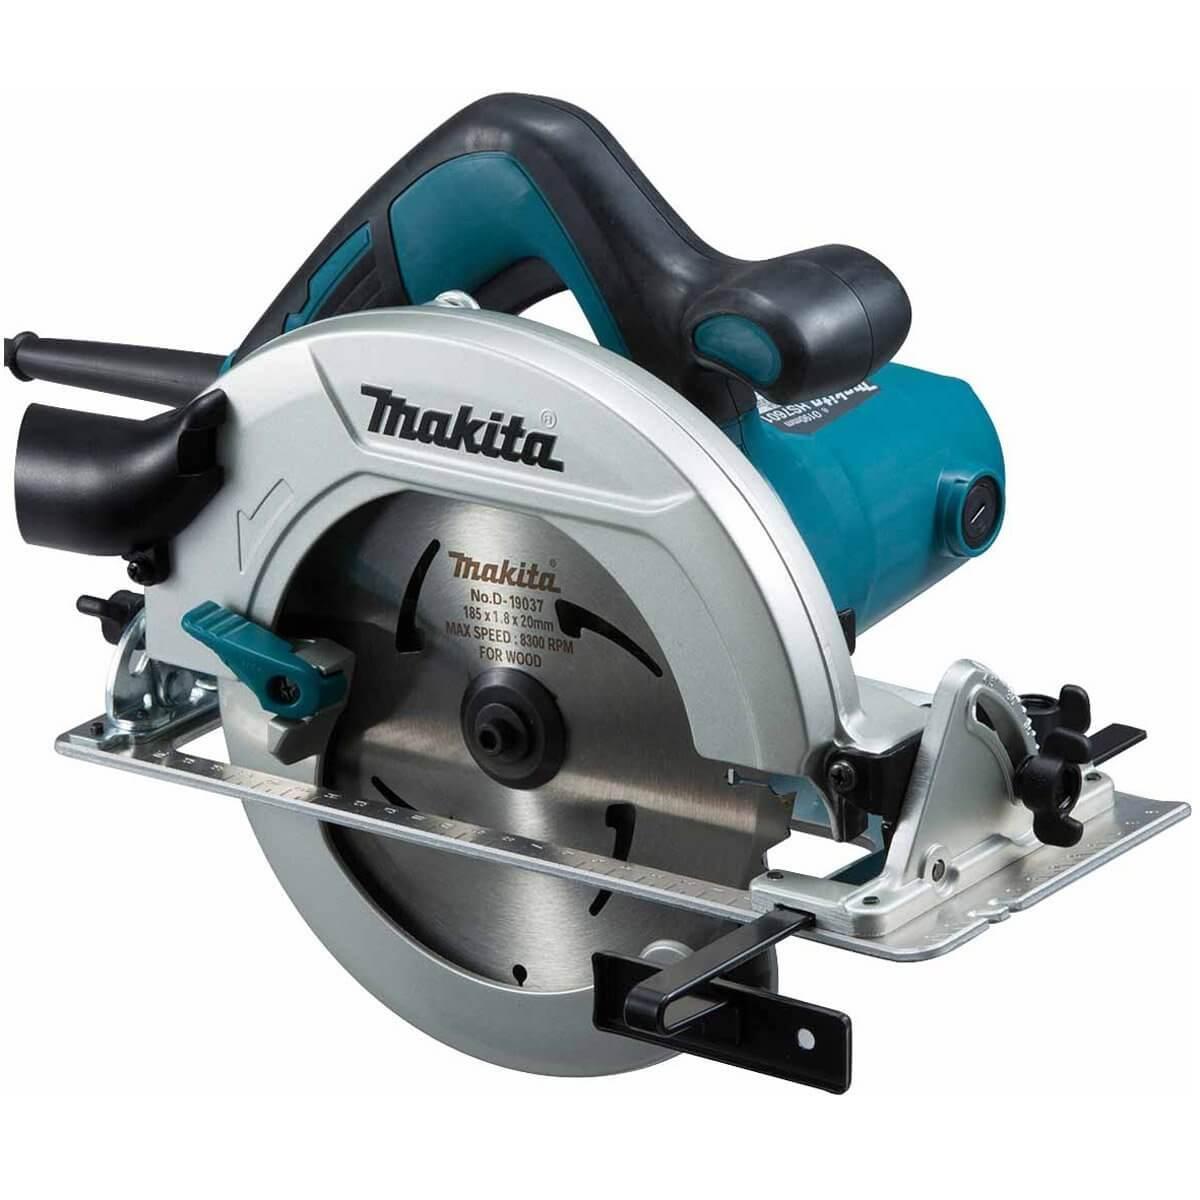 Makita-HS7601J-Scie-circulaire-2 Avis Scie circulaire Bosch Professional GKS 190 test comparatif